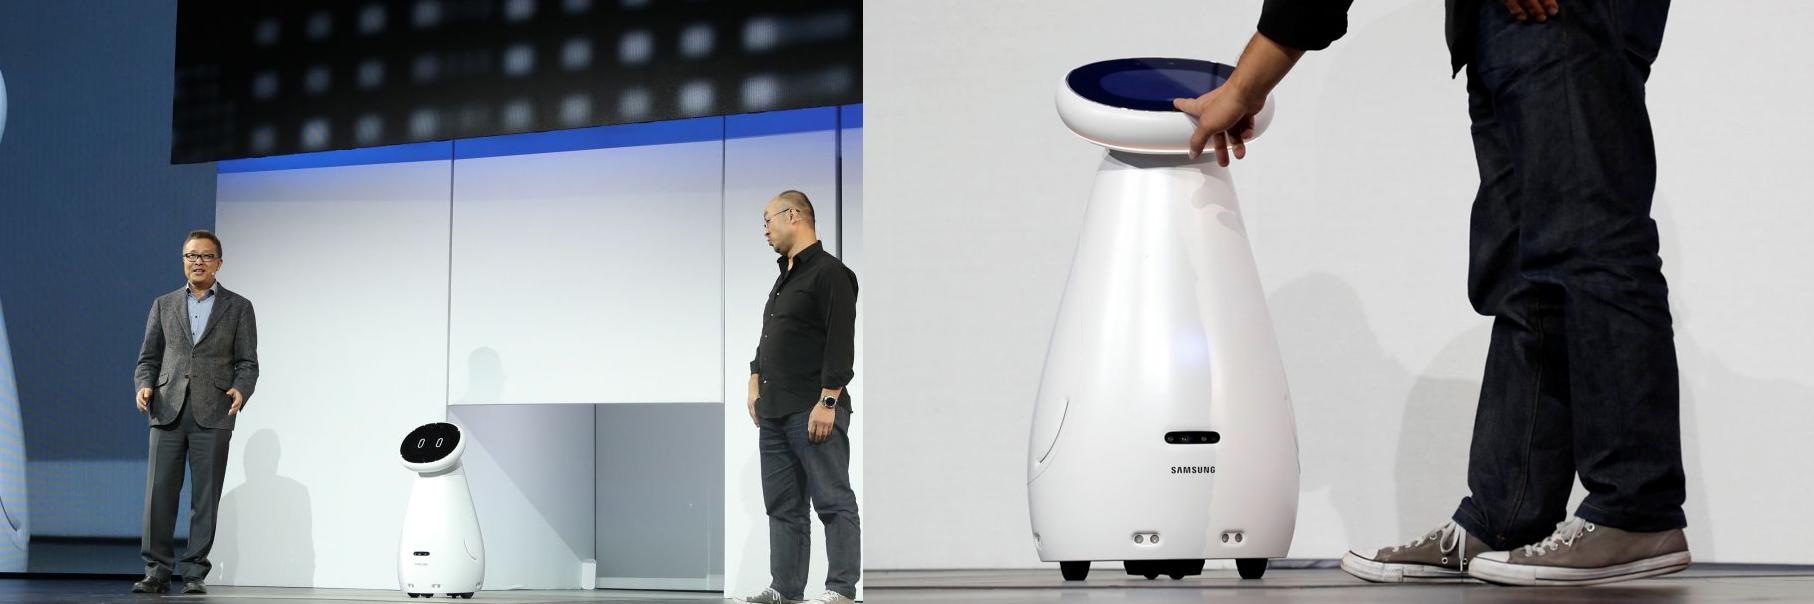 robot samsung